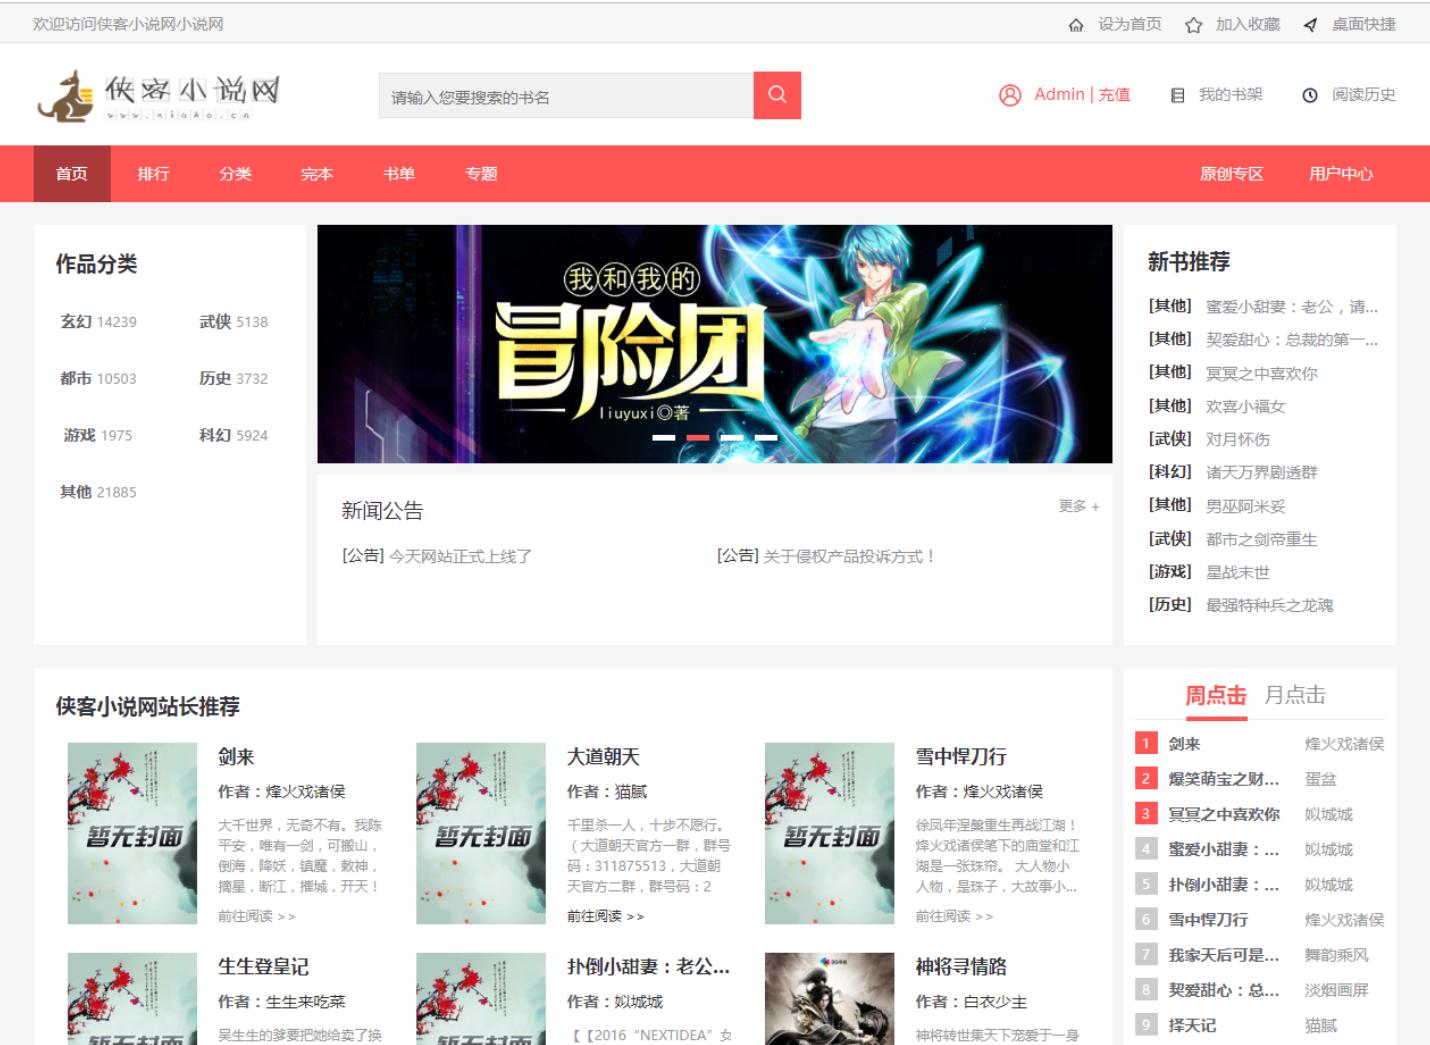 PTCMSv4.3.0全小说网站源码插图1